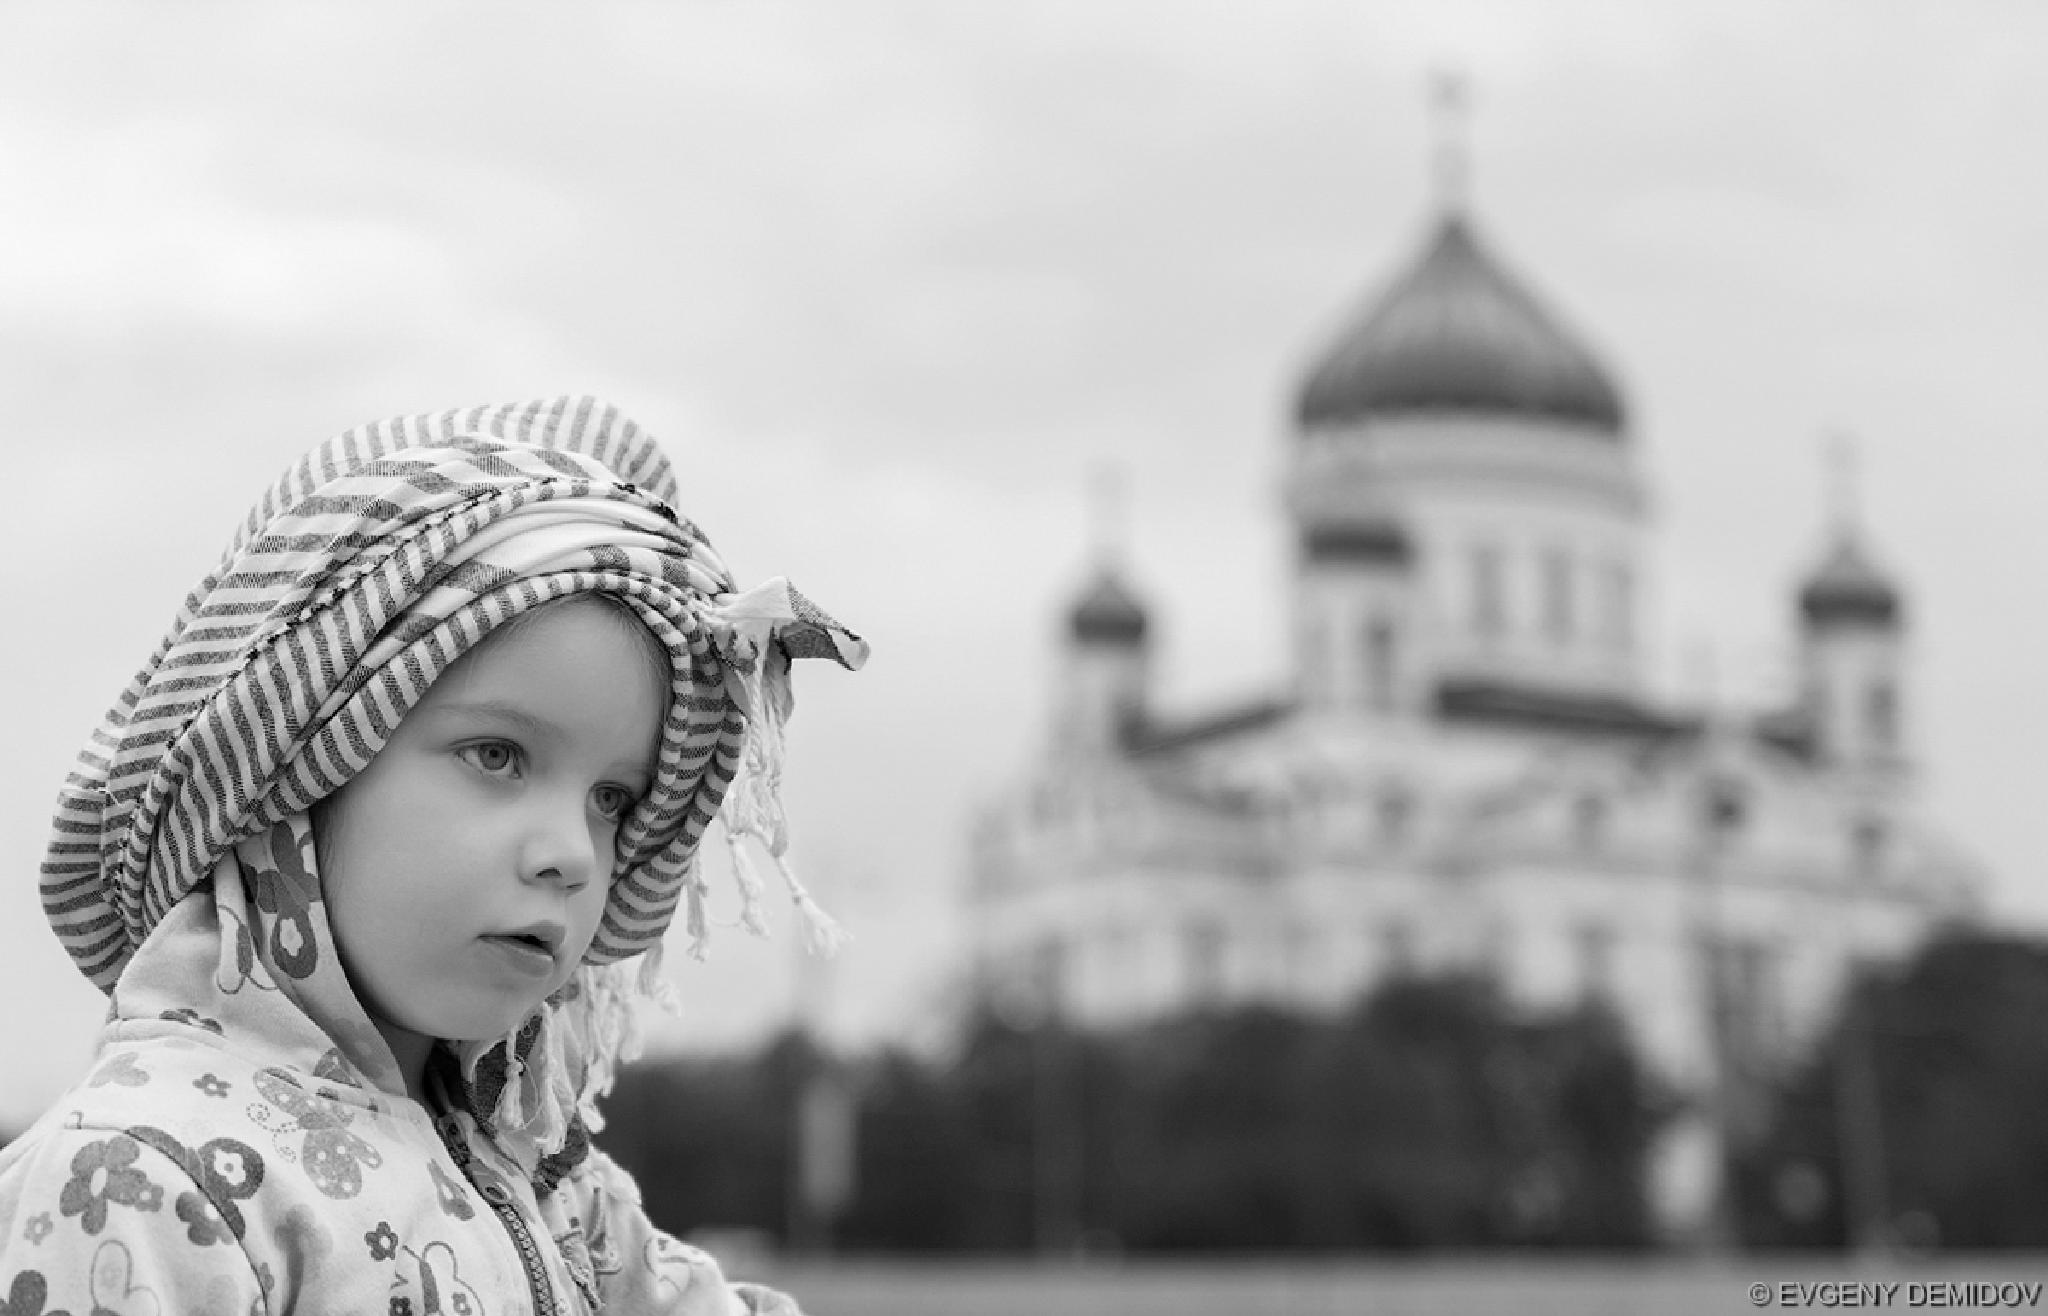 Untitled by Evgeny Demidov